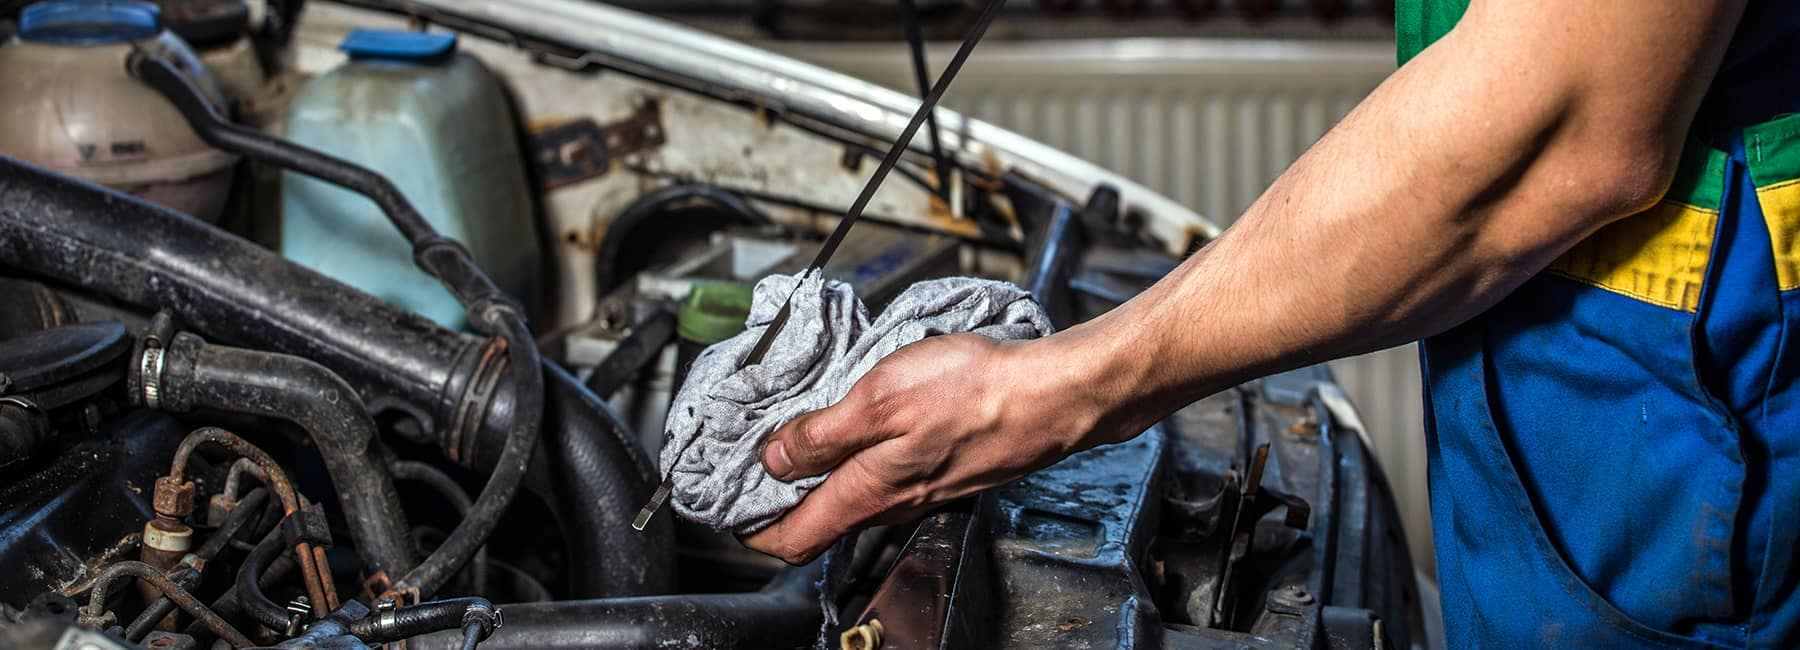 mechanic doing service